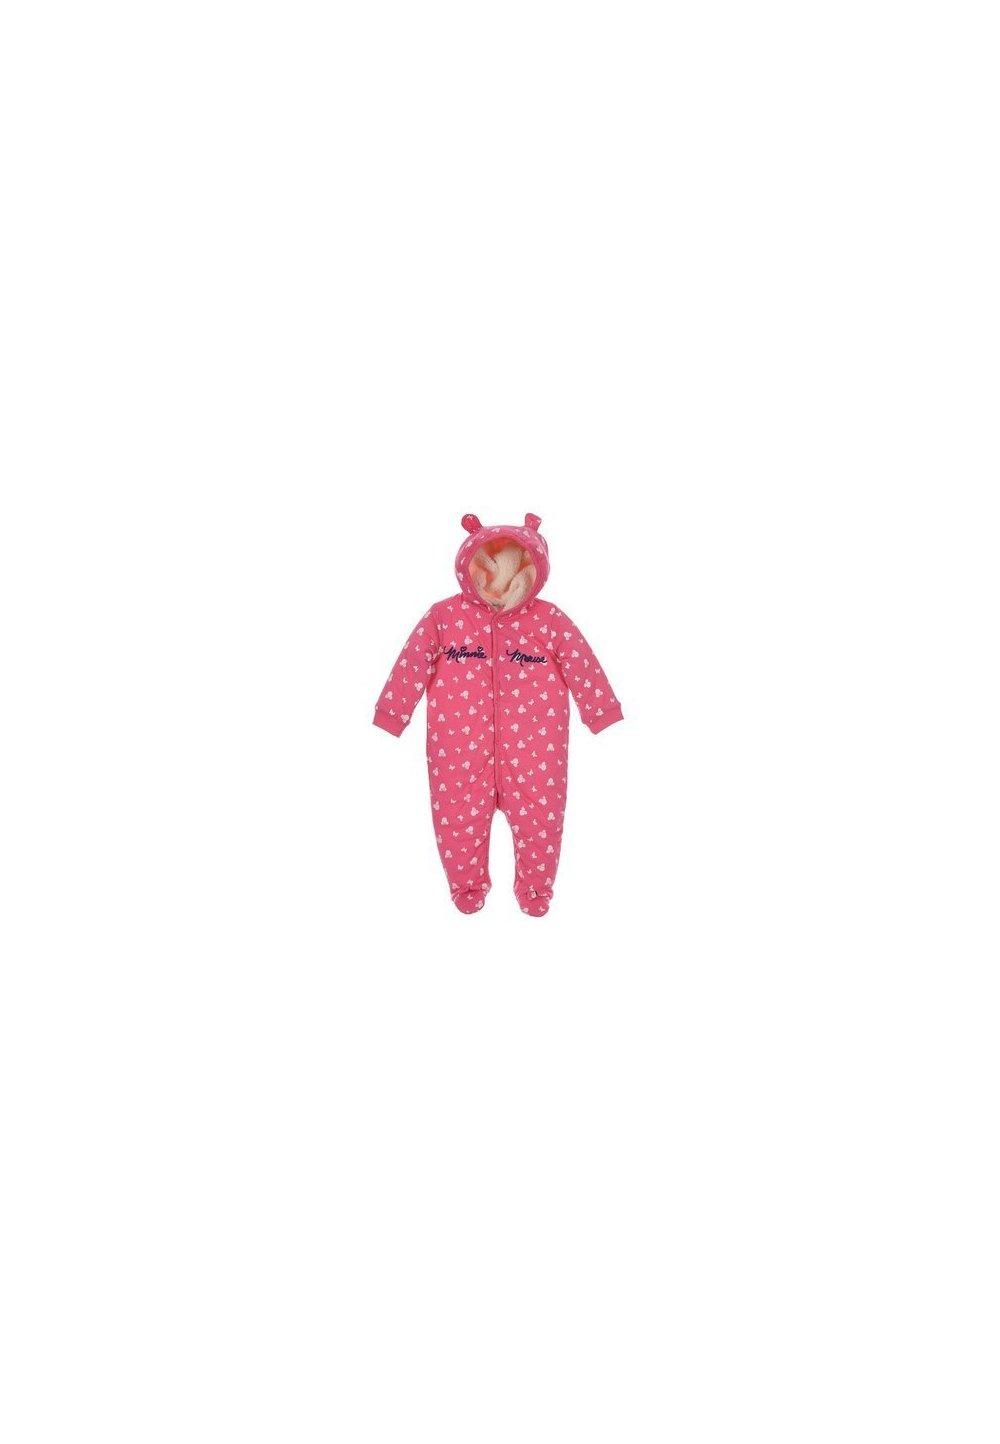 Salopeta cu gluga, Minnie Mouse, roz inchis imagine